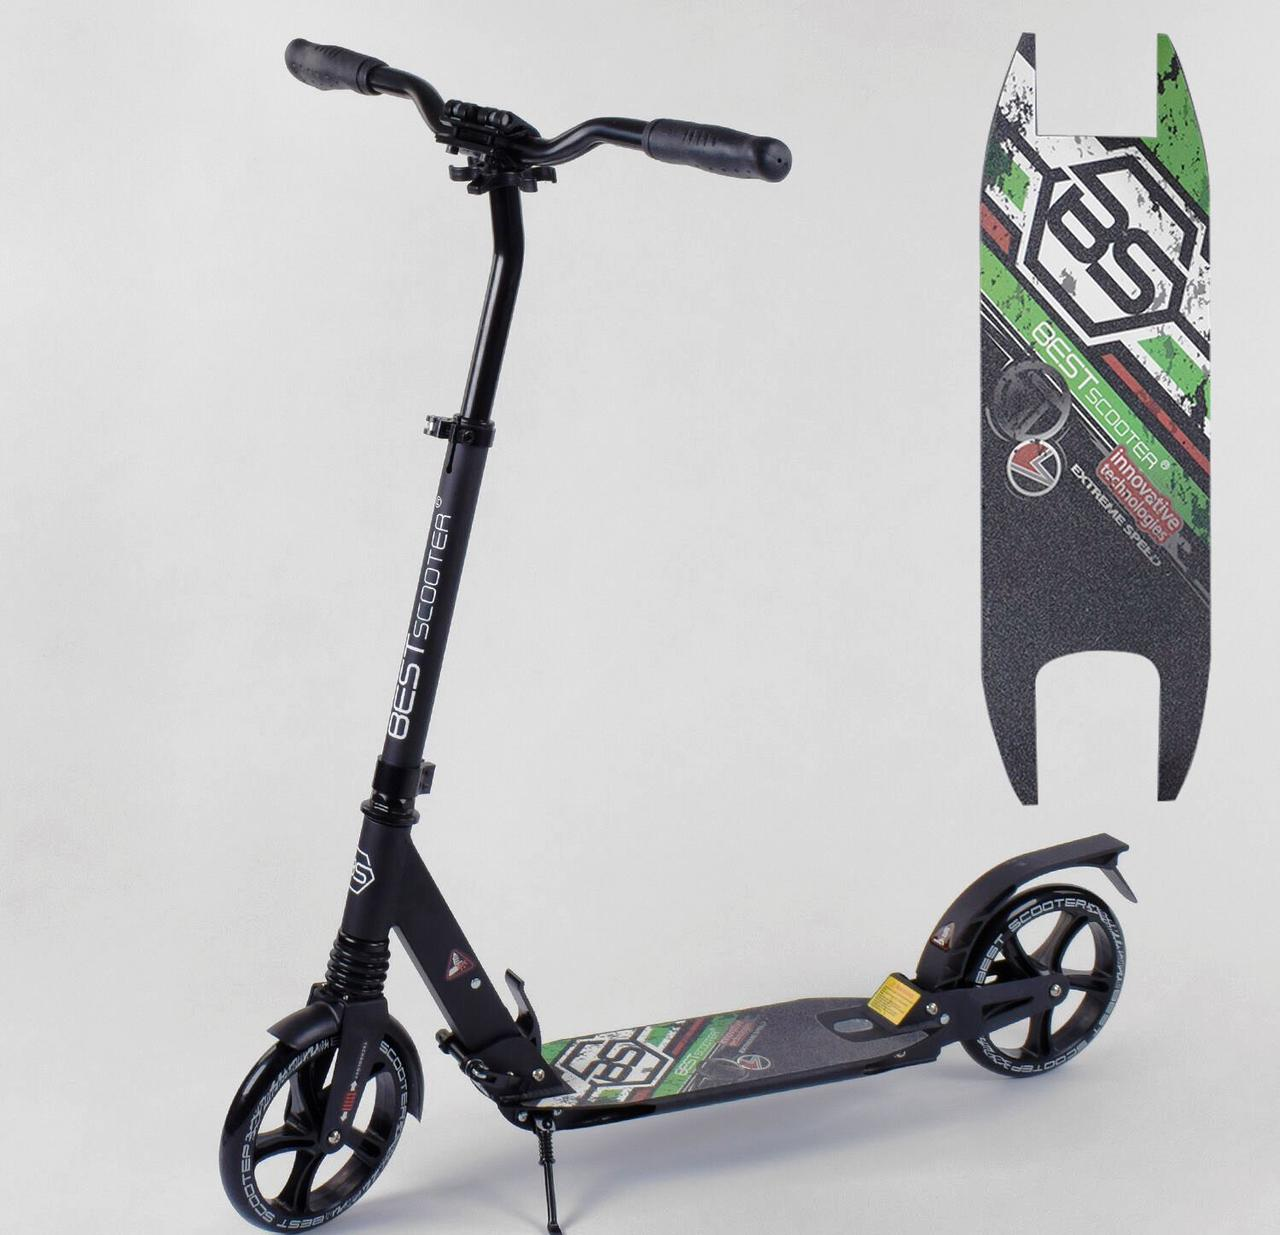 Самокат алюминиевый 33006 Best Scooter, d колес - 20см, колеса PU, 2 аммортизатора